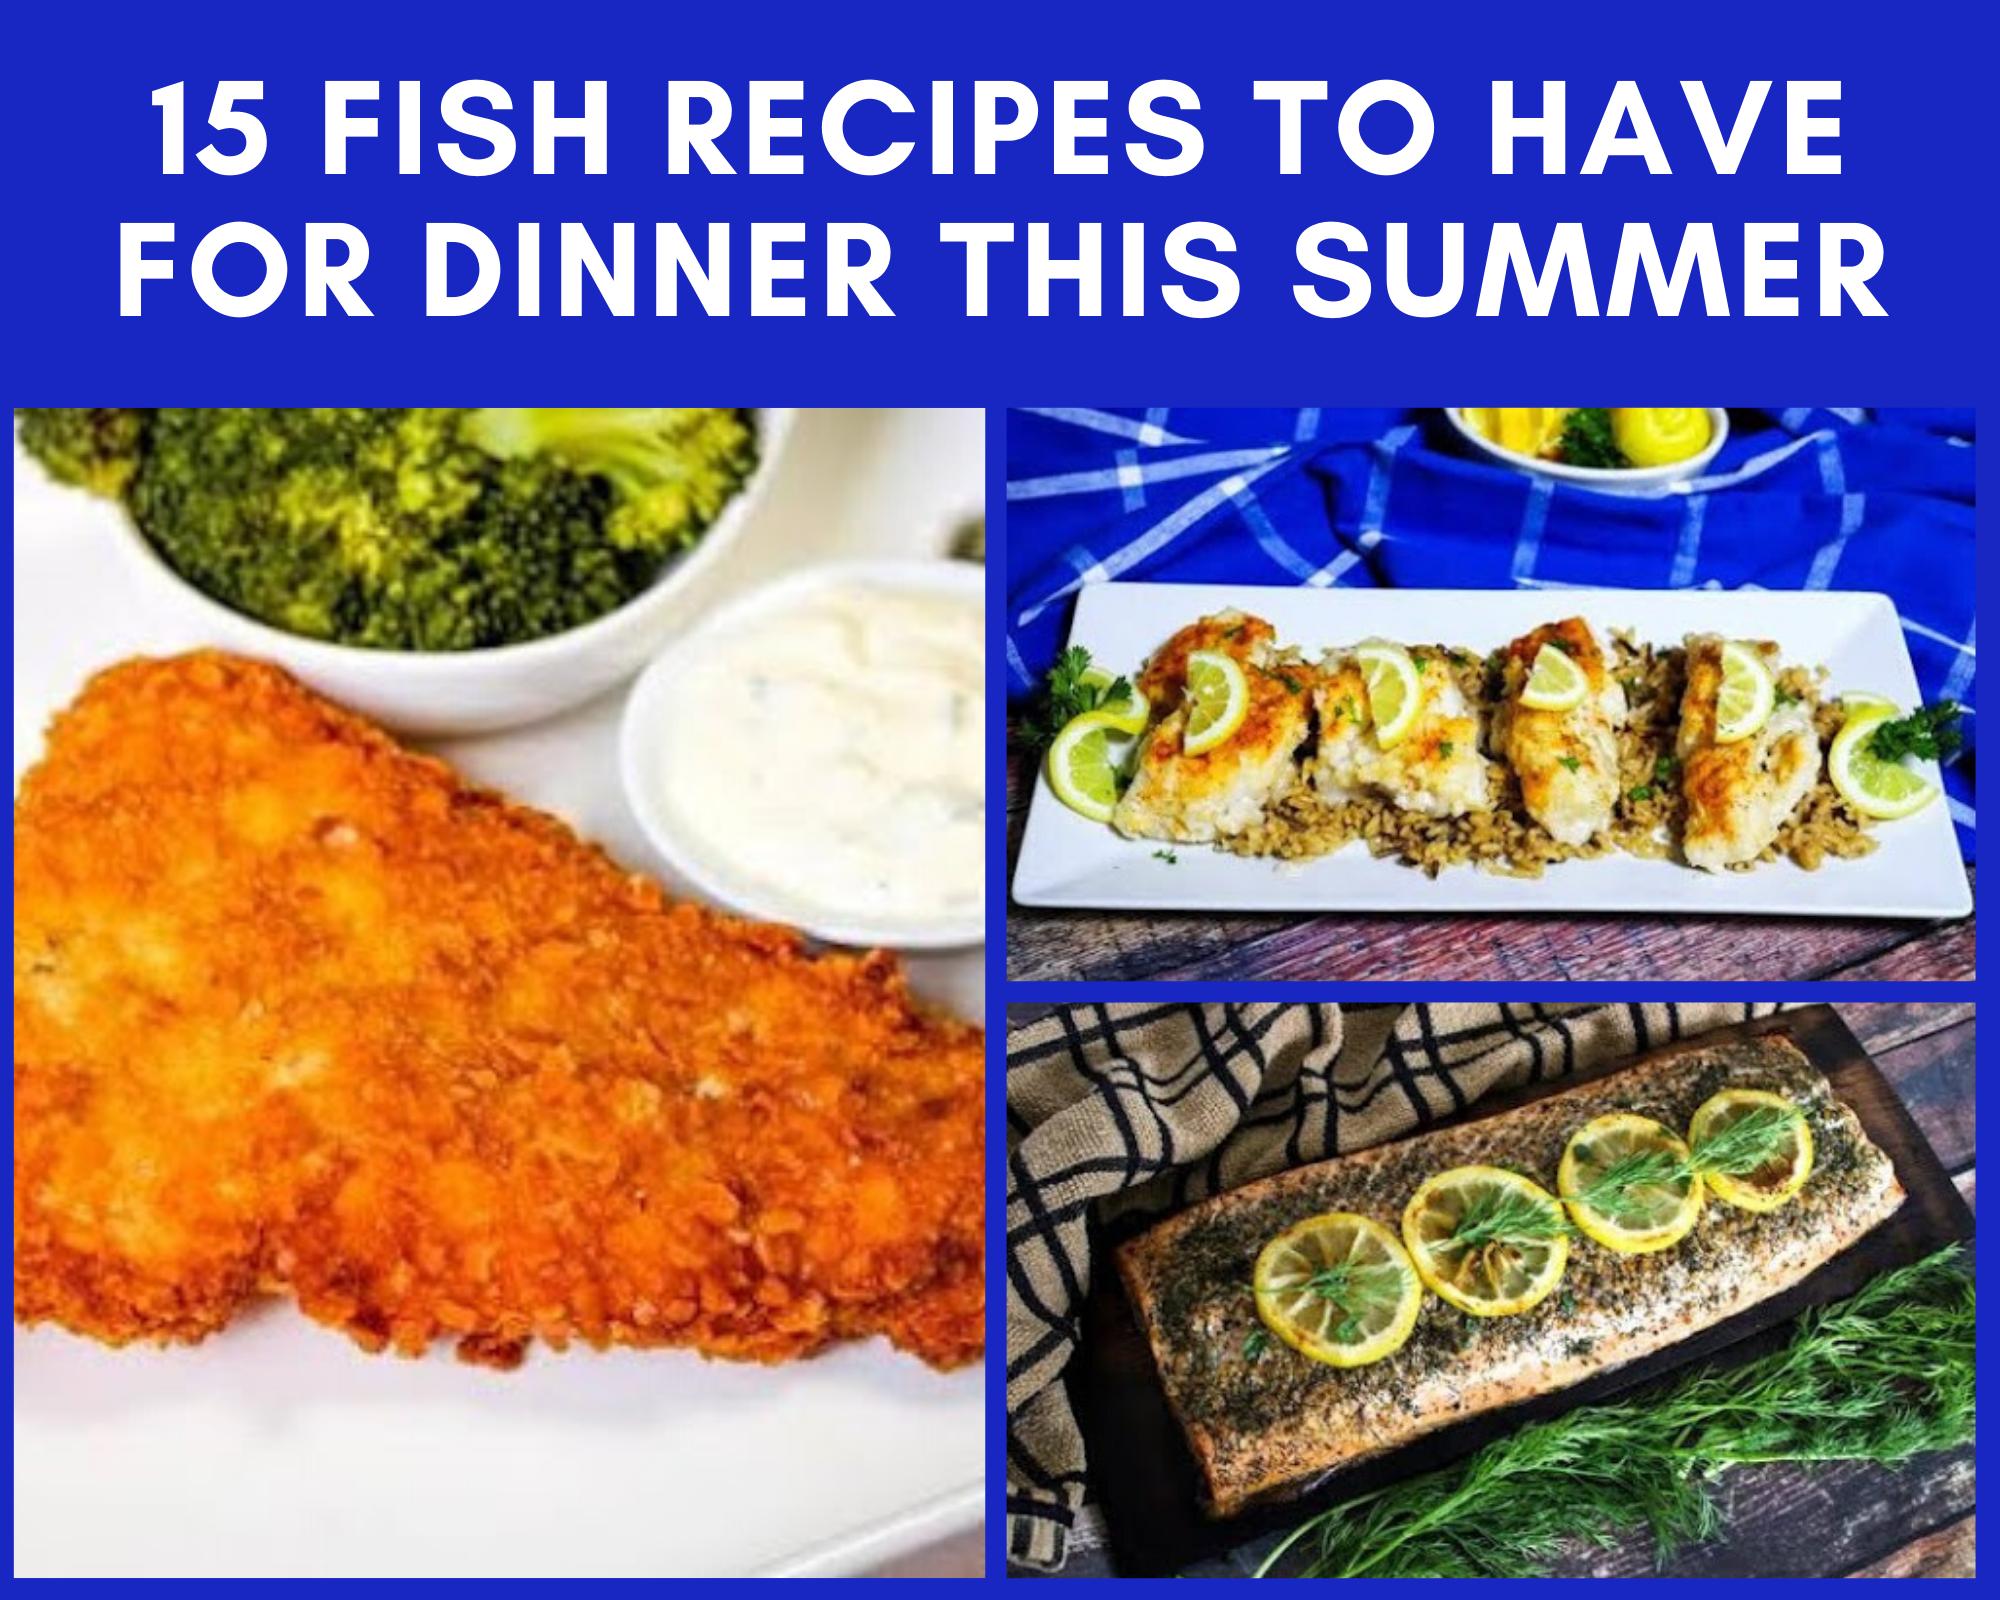 Fried cod, lemon butter fish and cedar plank salmon recipes